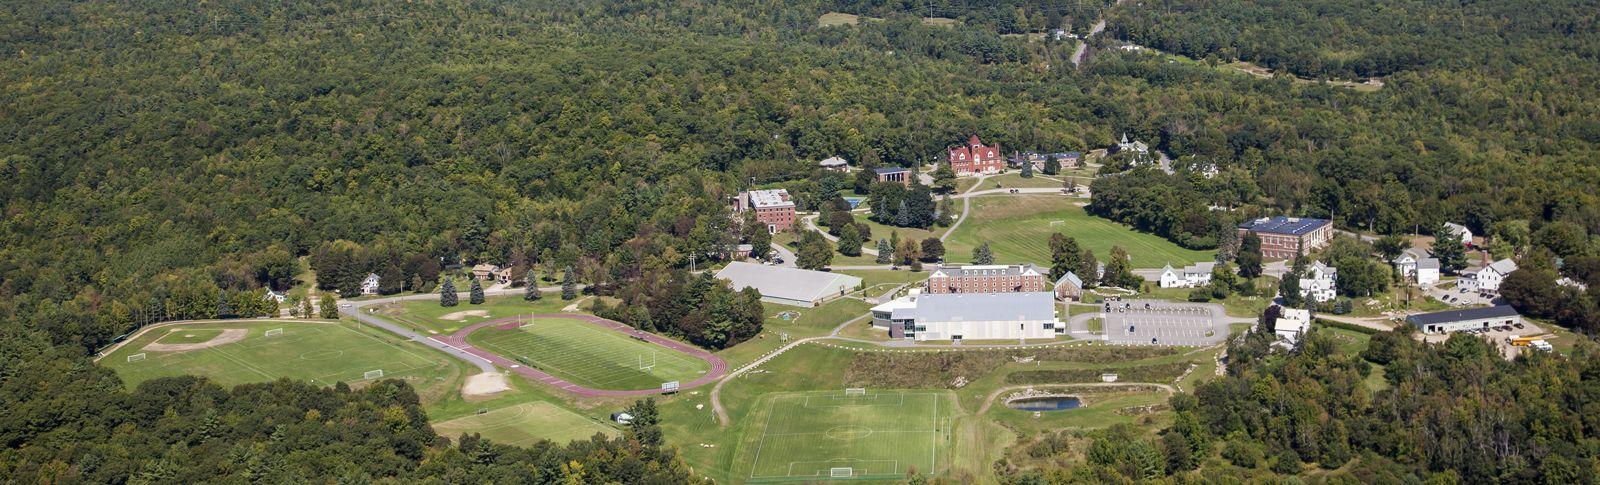 Hebron Academy ~ College preparatory boarding school in New England